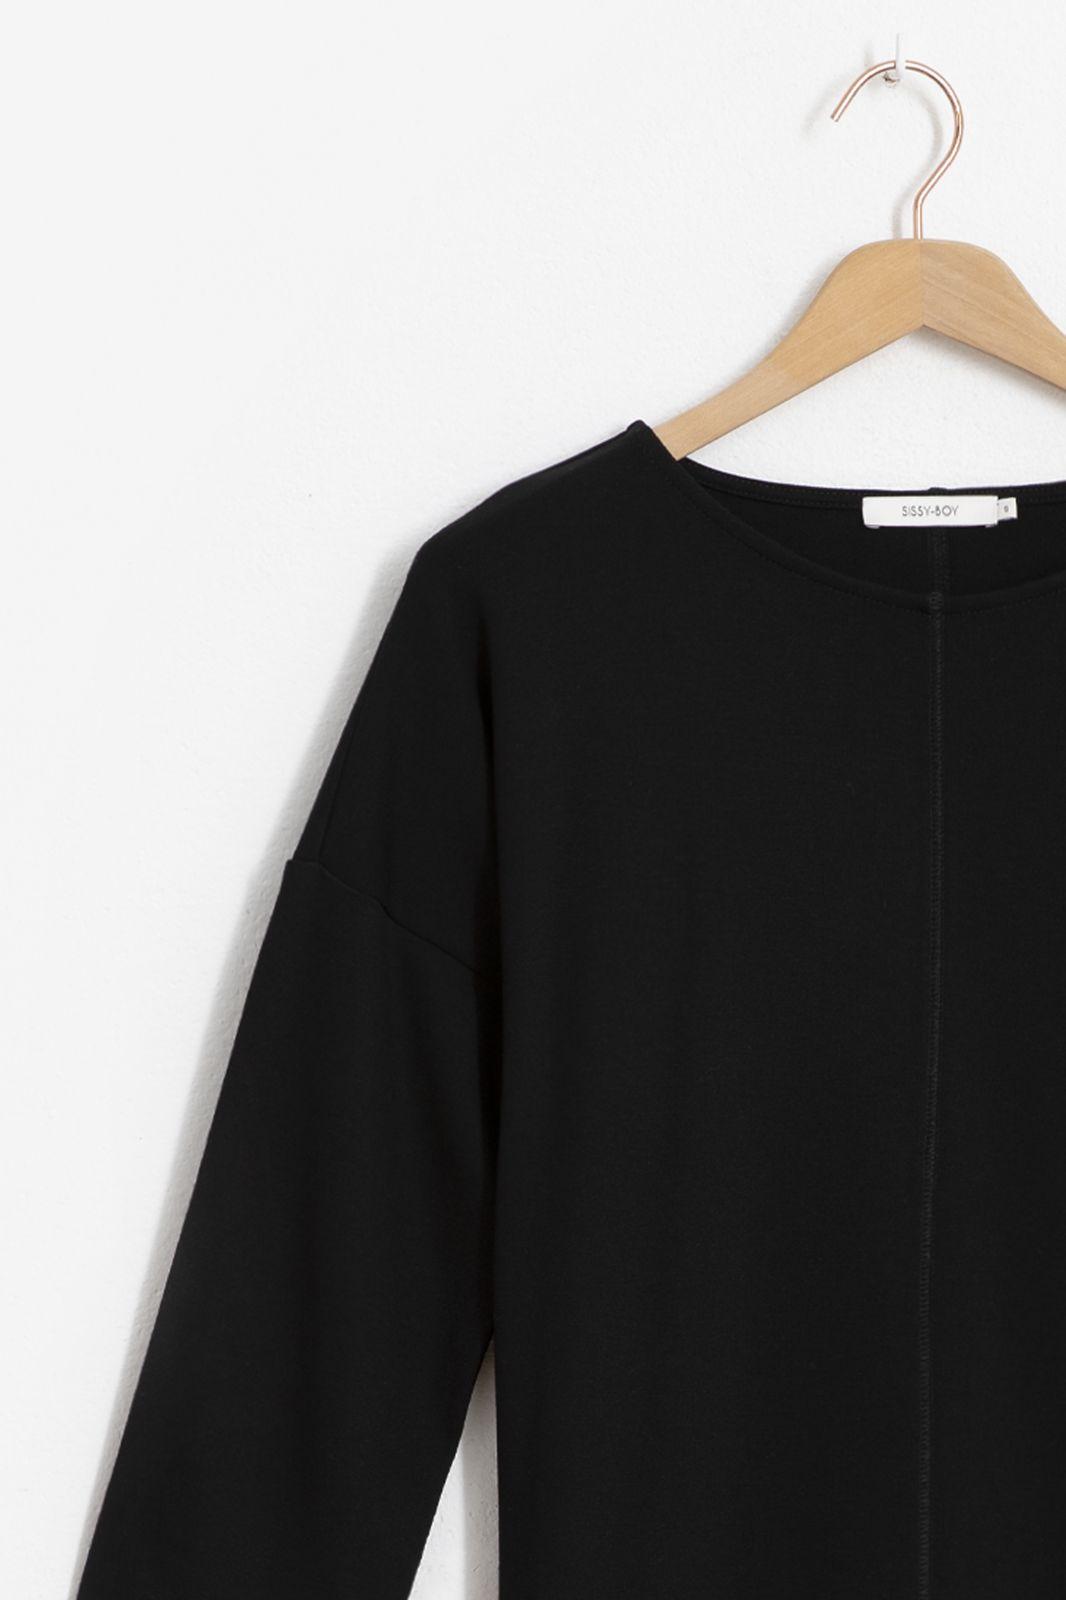 Zwarte jersey jurk met schouderknopen - Dames | Sissy-Boy